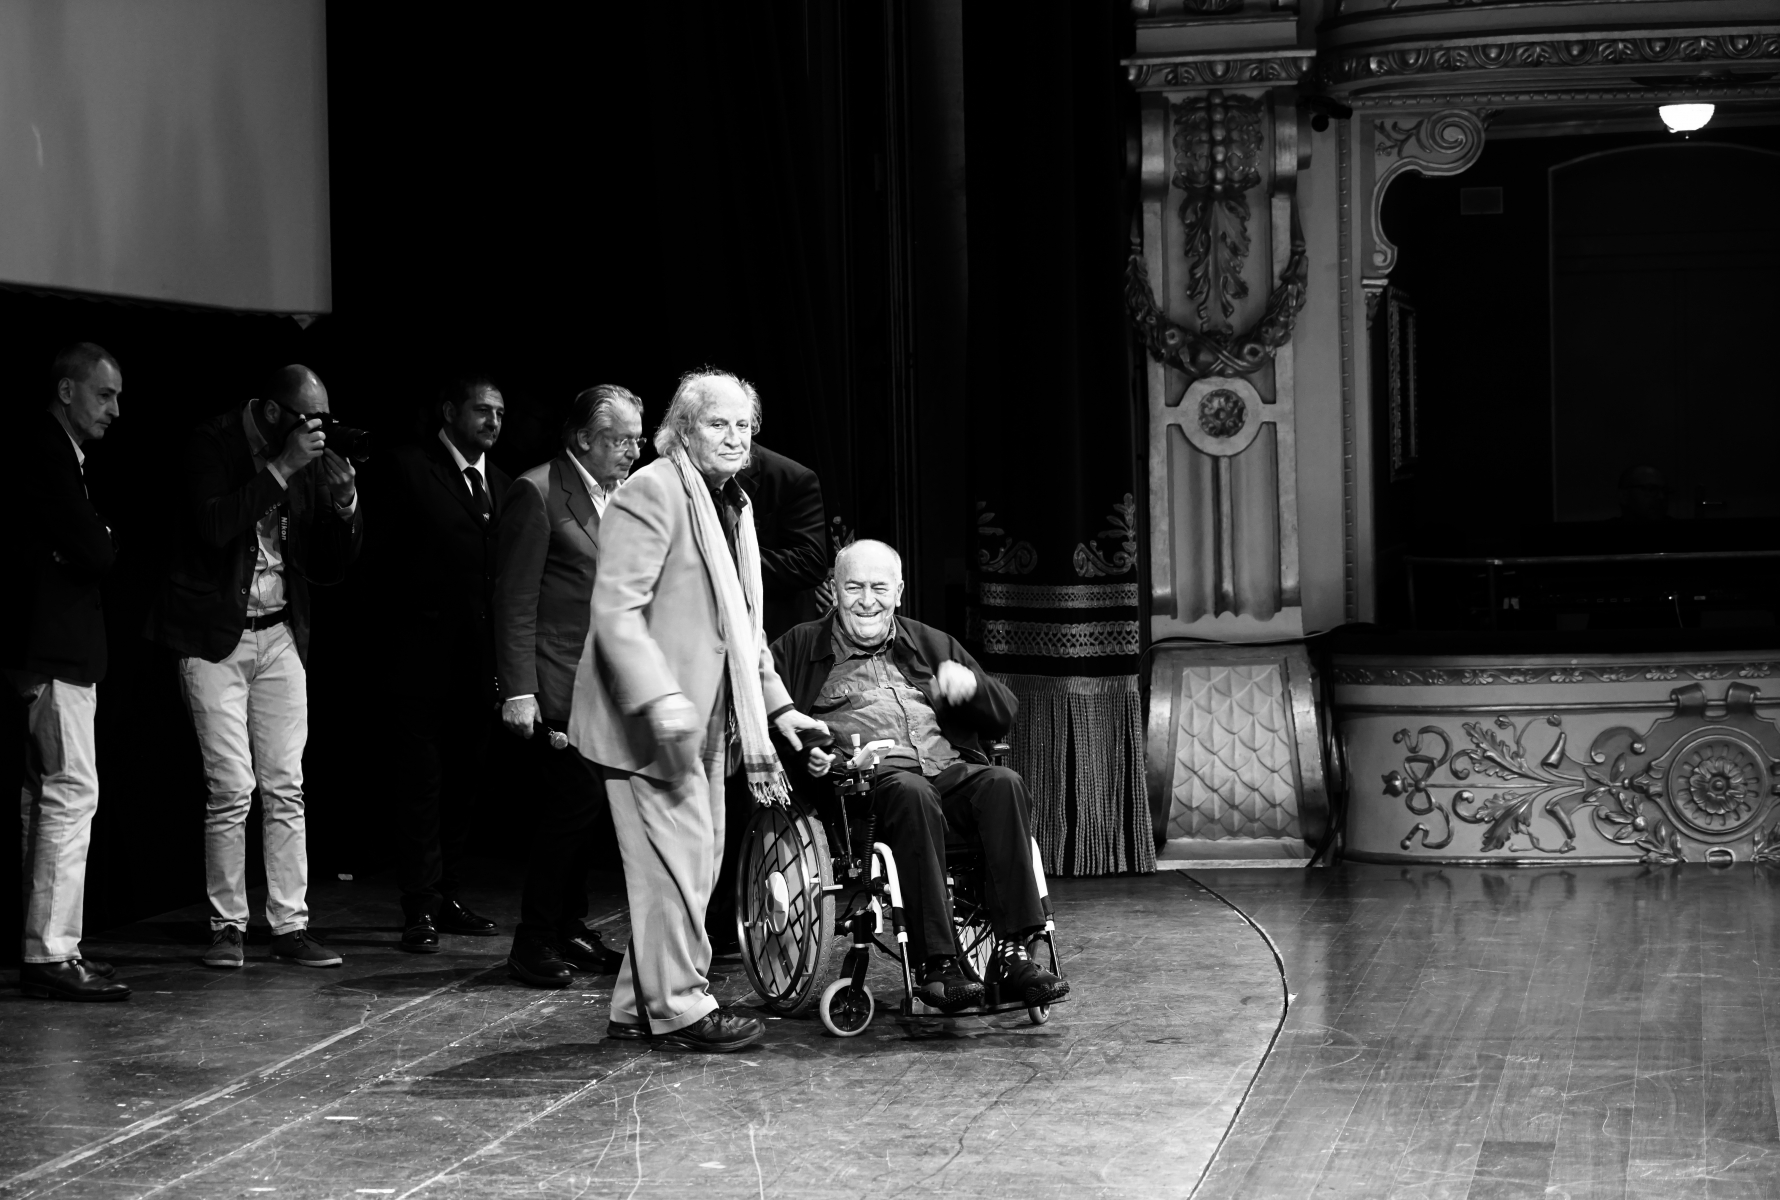 Vittorio Storaro, Bernardo Bertolucci